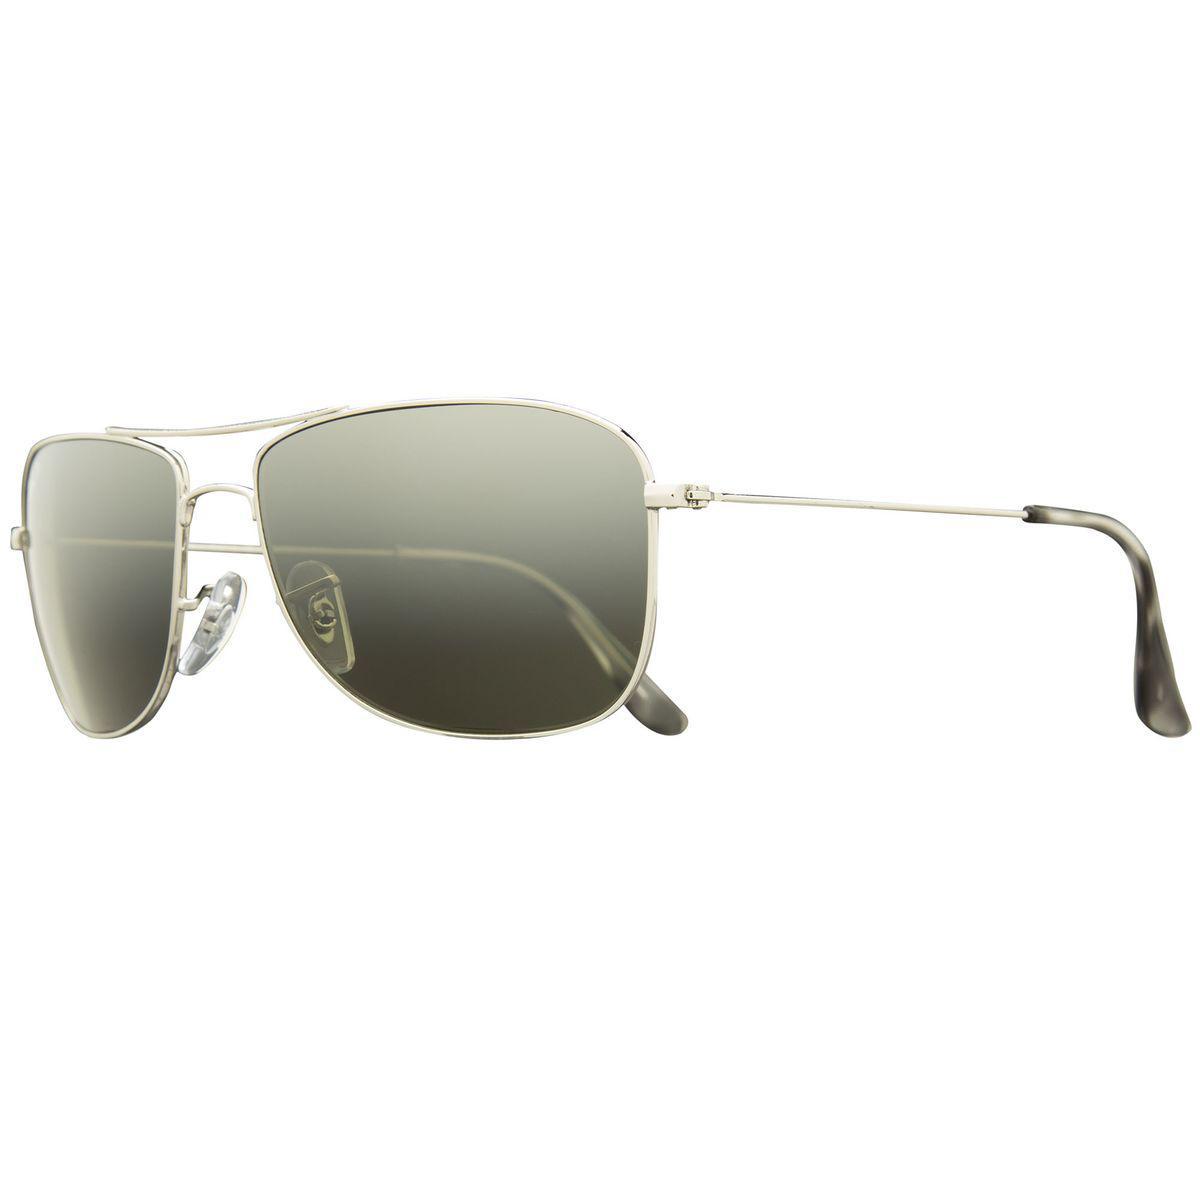 d16c4b4138 Lyst - Ray-Ban Rb3543 Chromance Polarized Sunglasses in Metallic